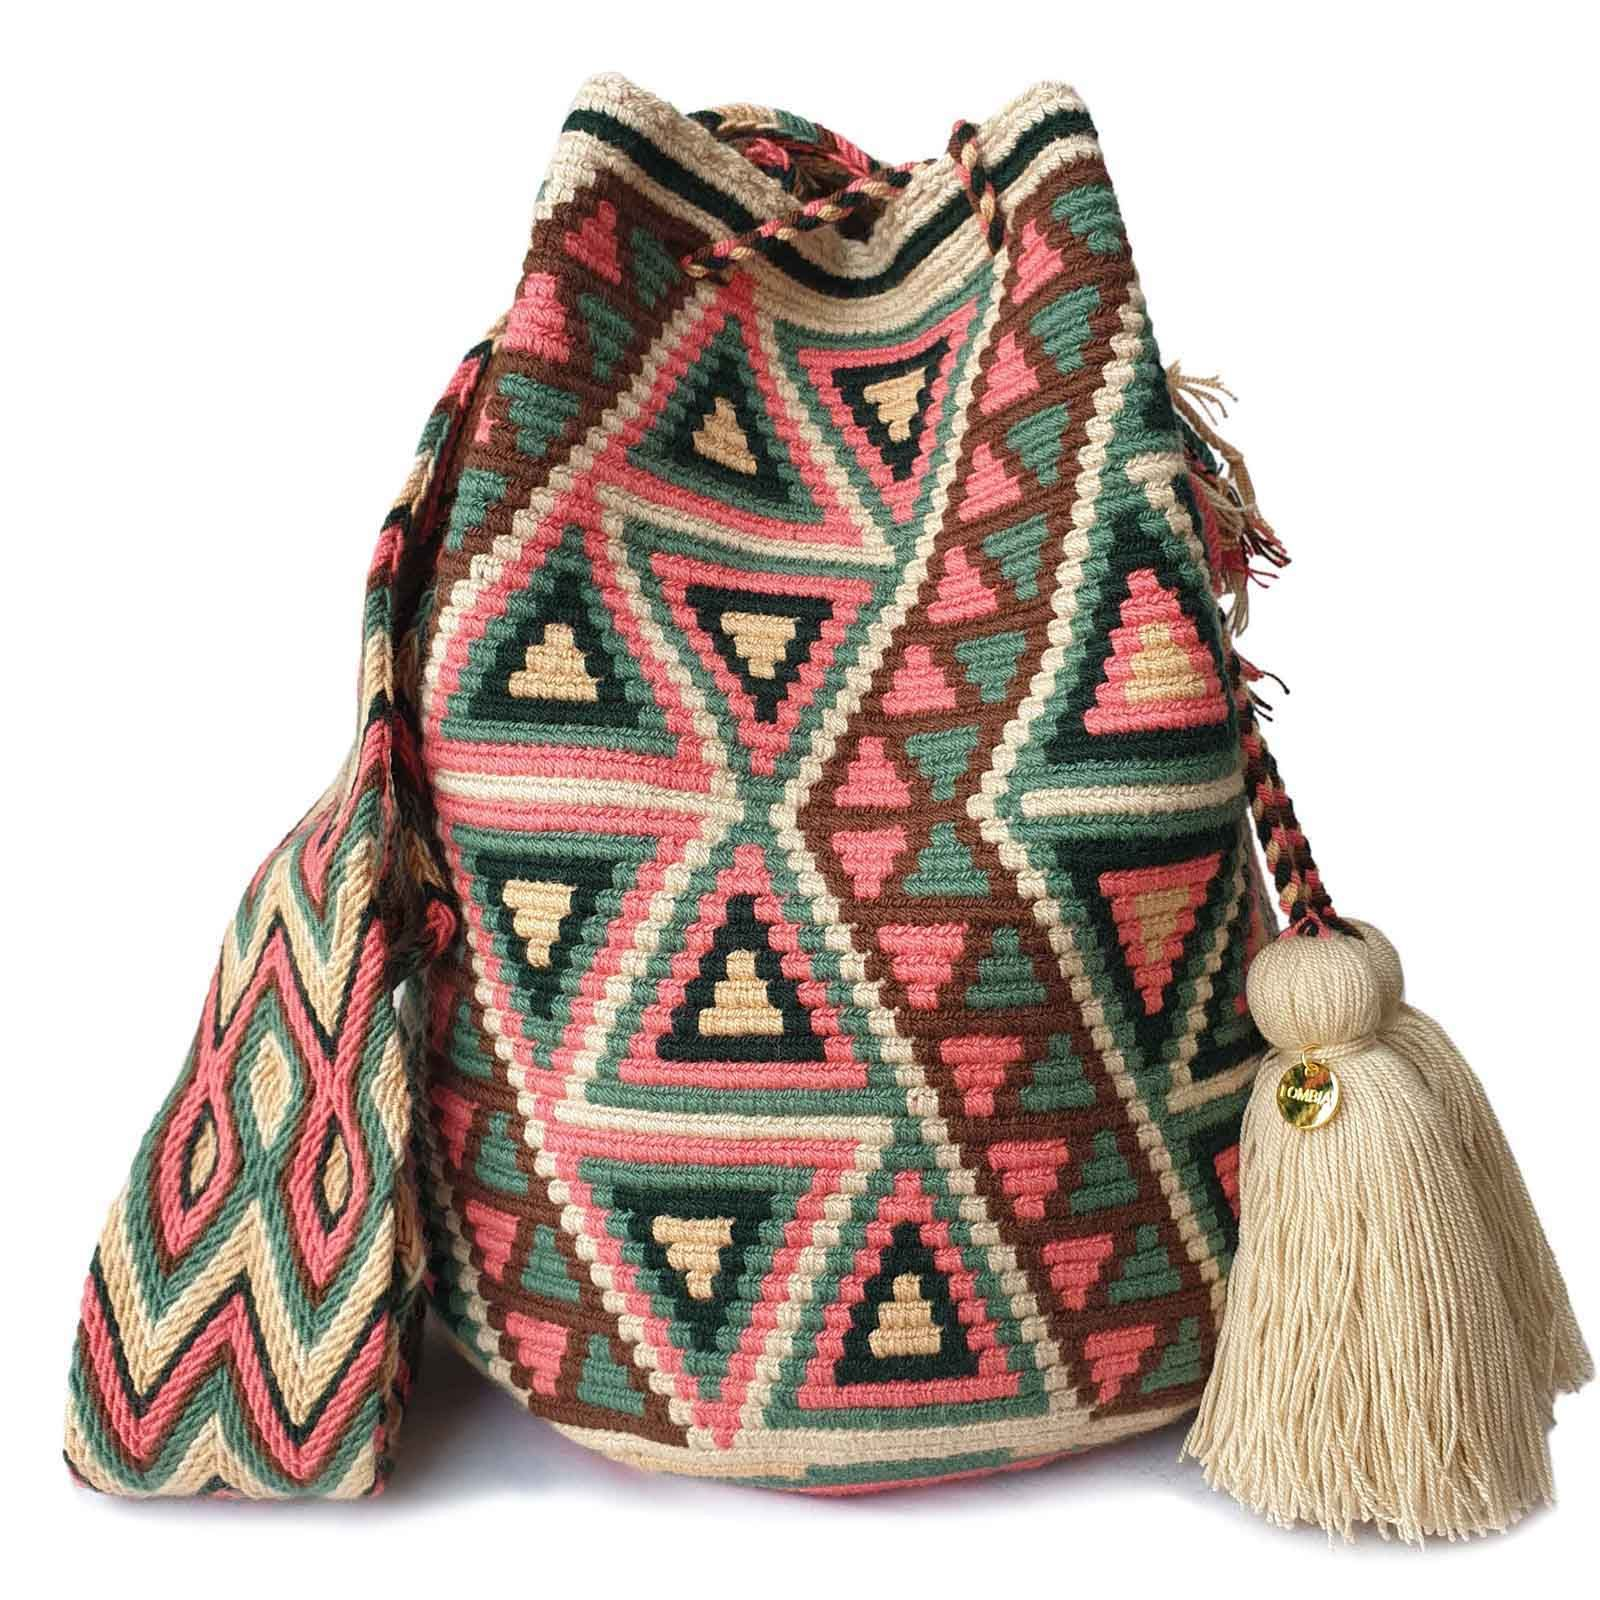 Gorgeous /& Authentic Handwoven WAYUU Mochila